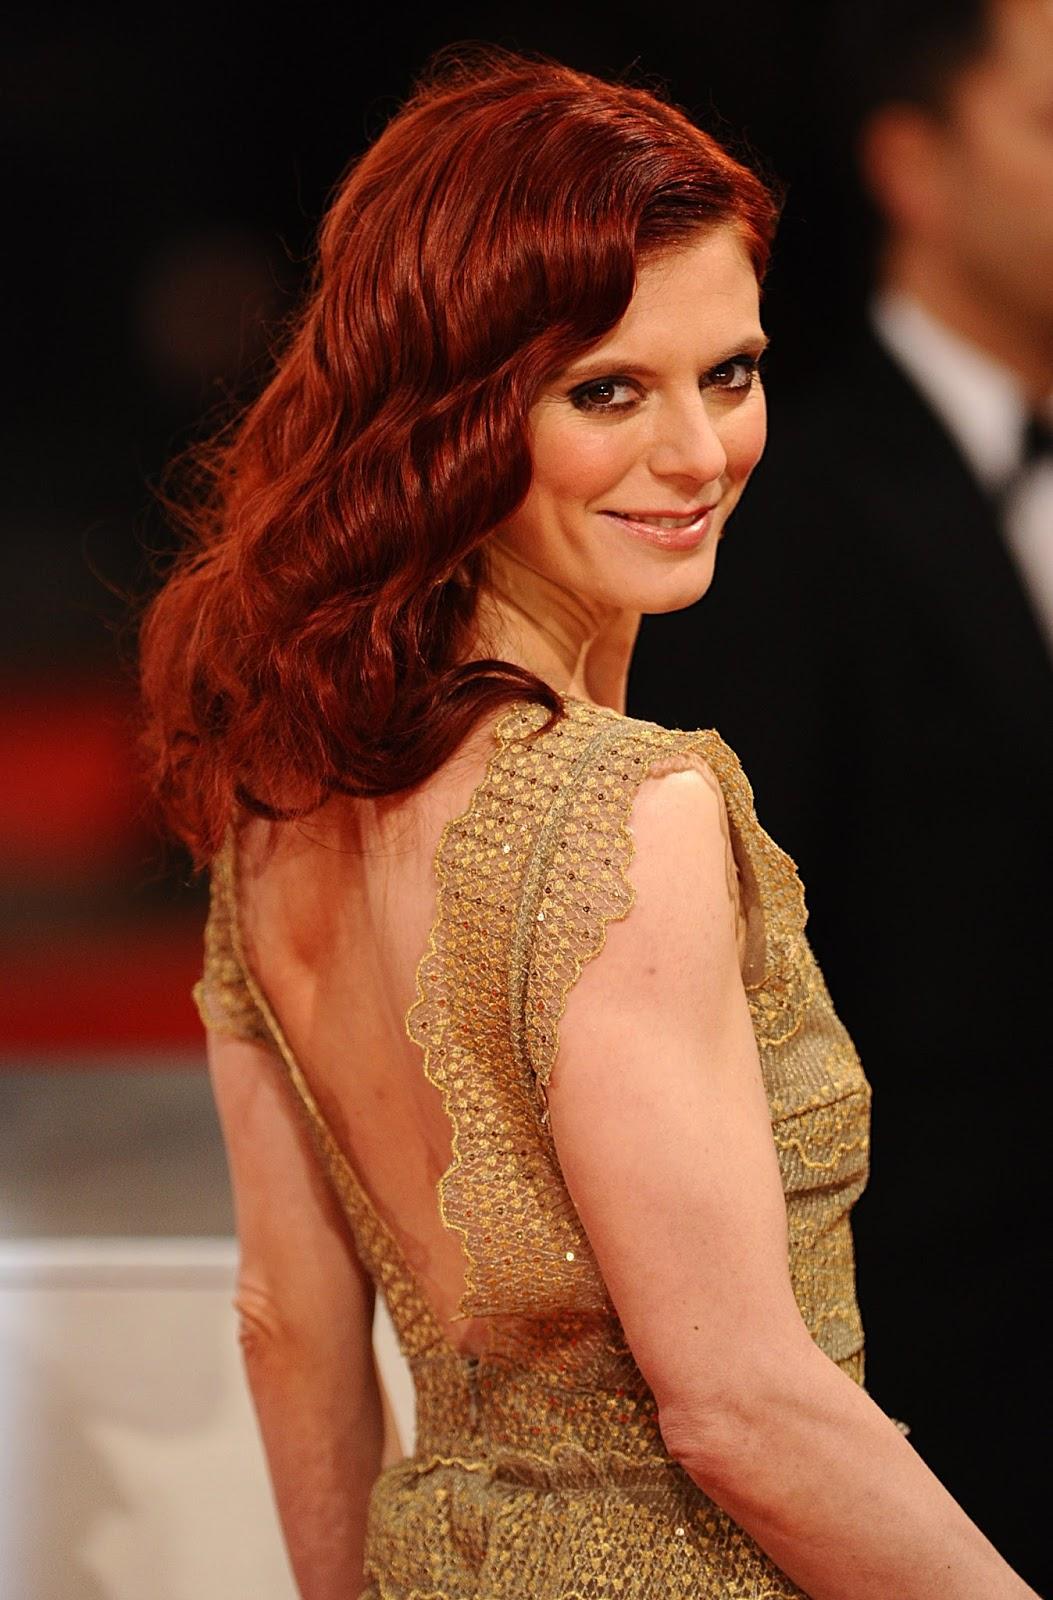 Emilia Fox Cute Hq Photos Orange British Academy Film Awards 2012